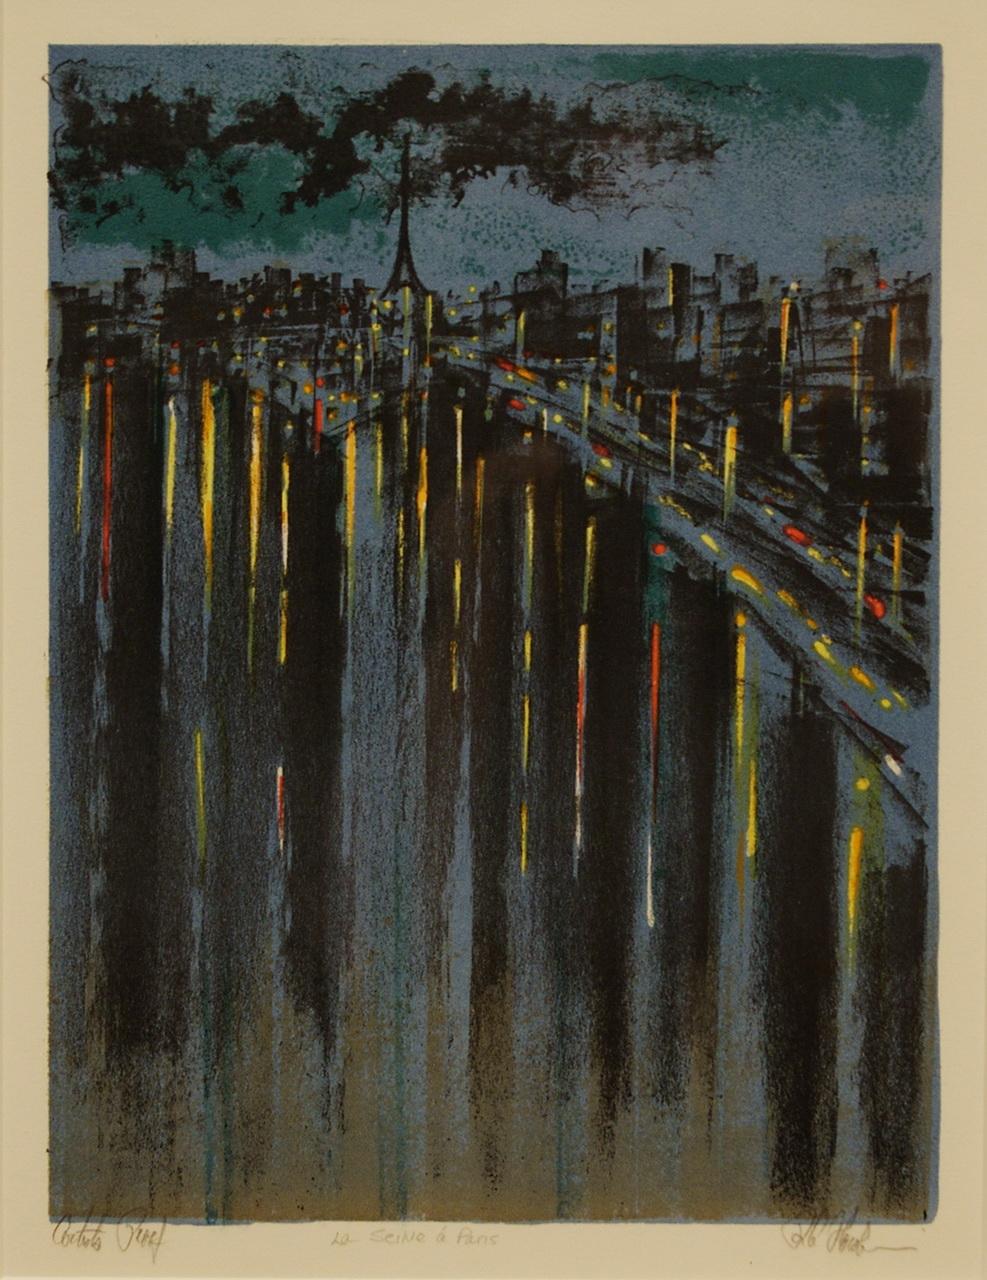 Richard Florsheim, Paris (aka La Seine a Paris, 1963, Color lithograph, Polk Museum of Art Permanent Collection 2004.8.14, Gift of the Richard Florsheim Art Fund